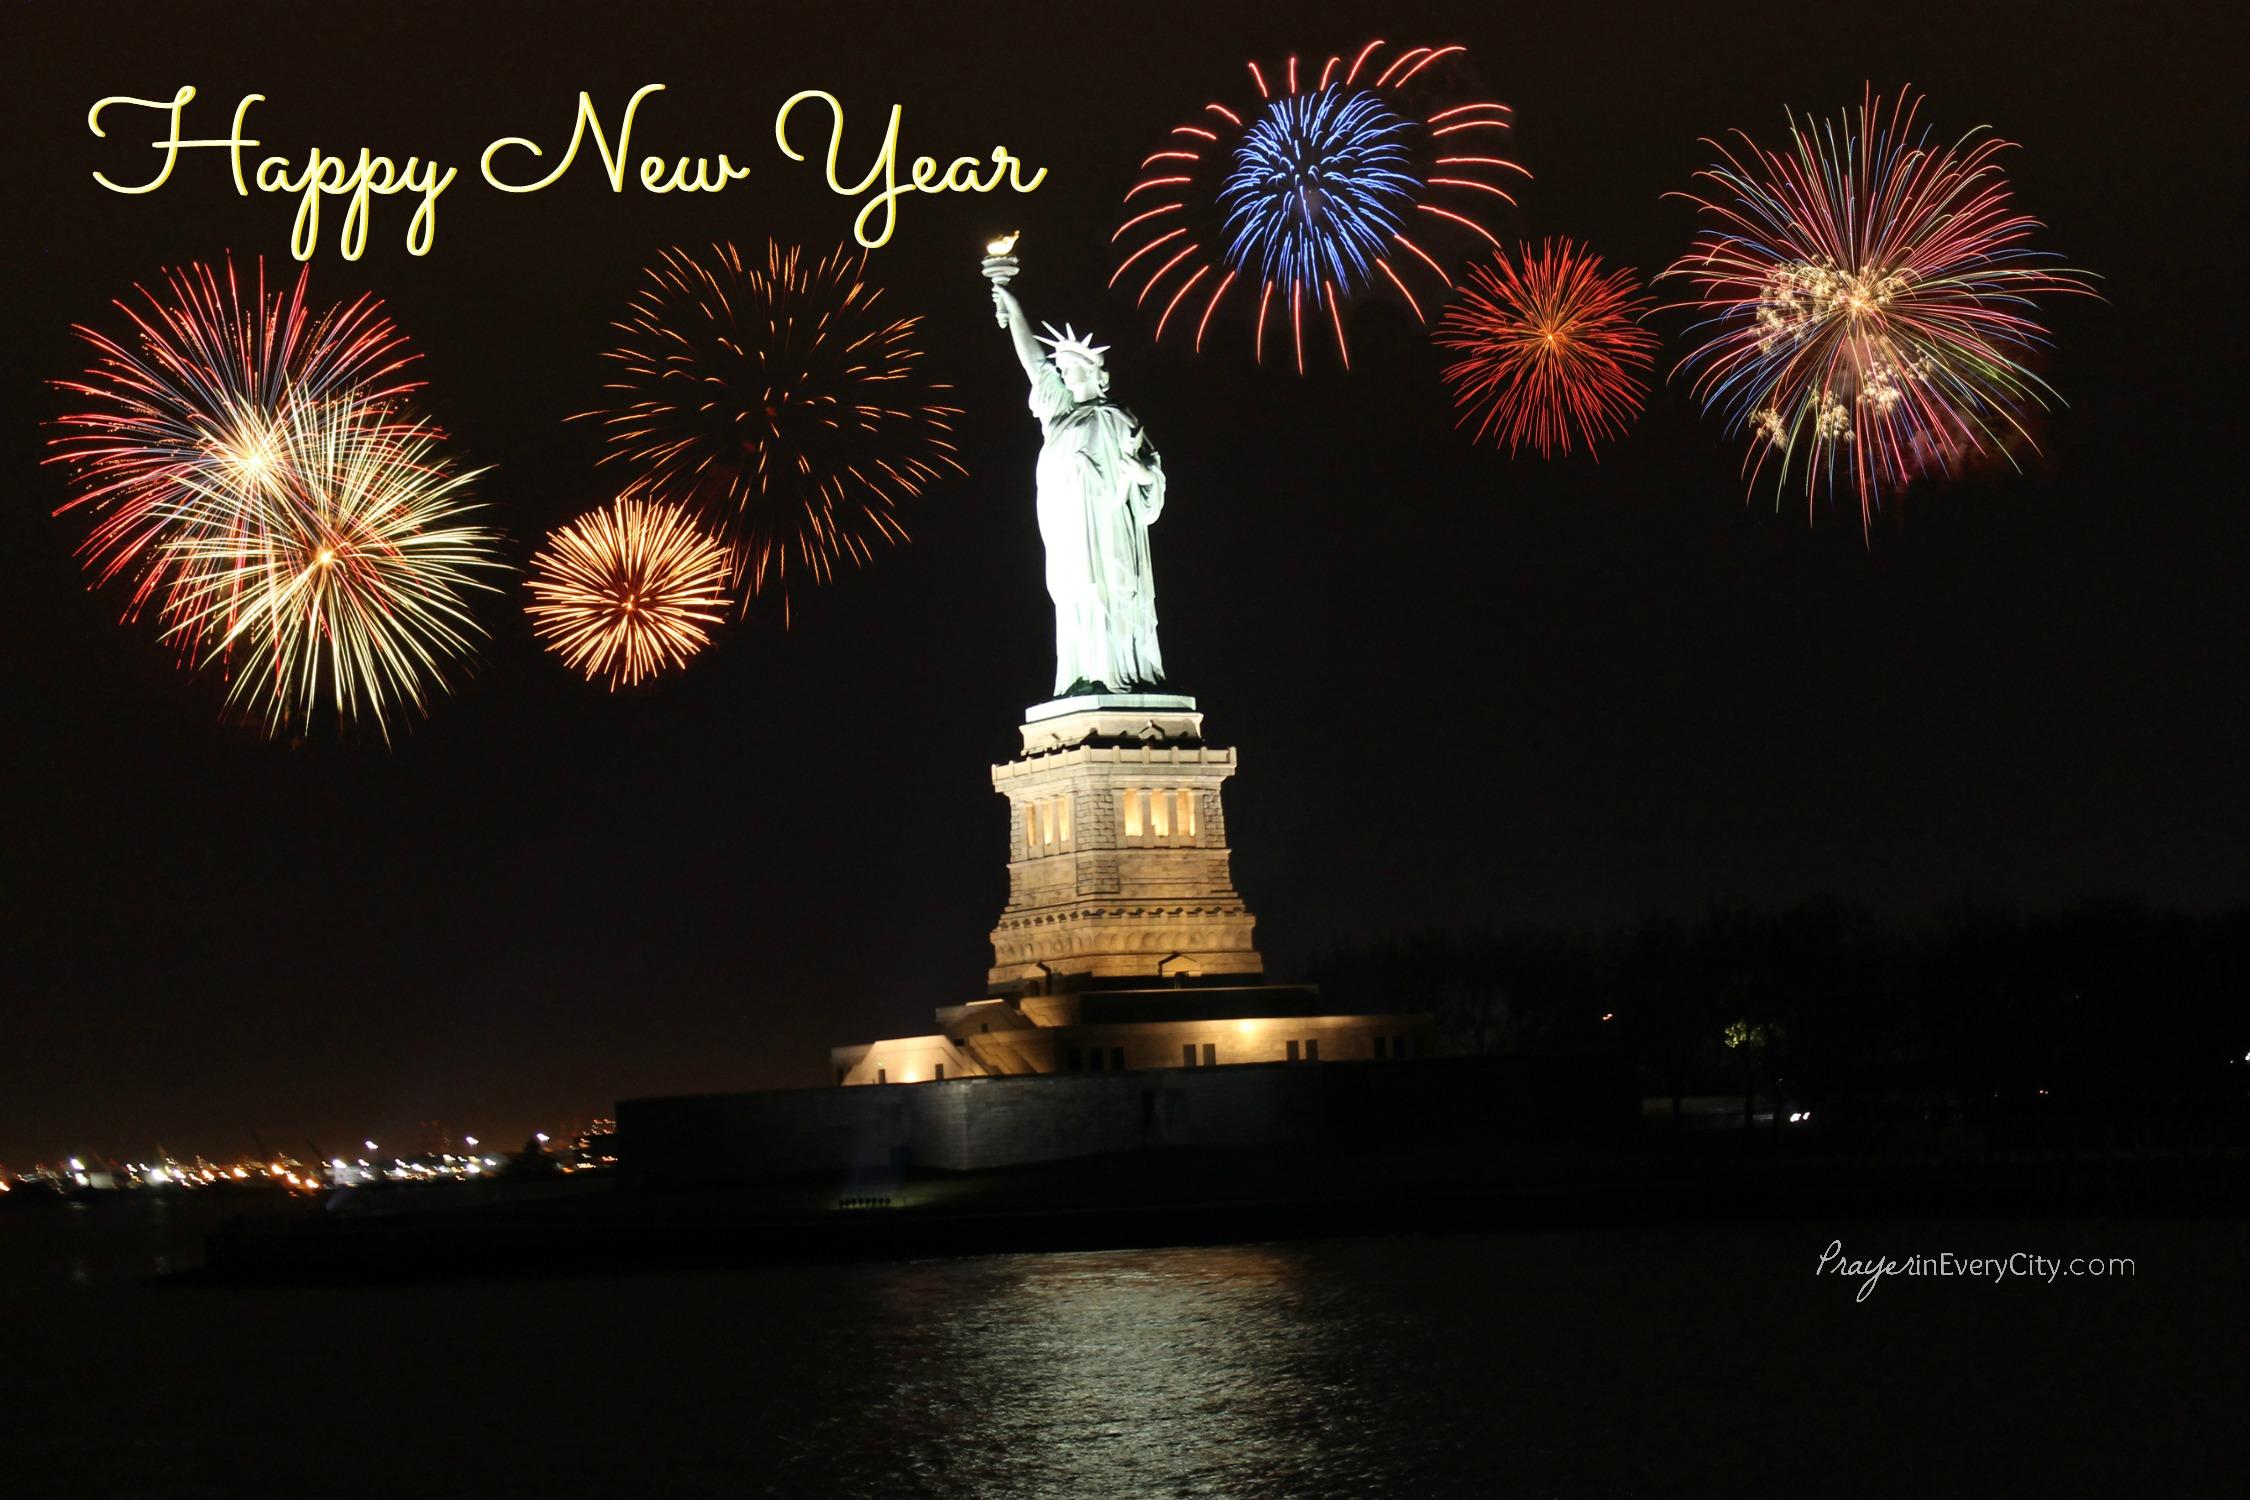 Happy New Year – Prayer In Every City